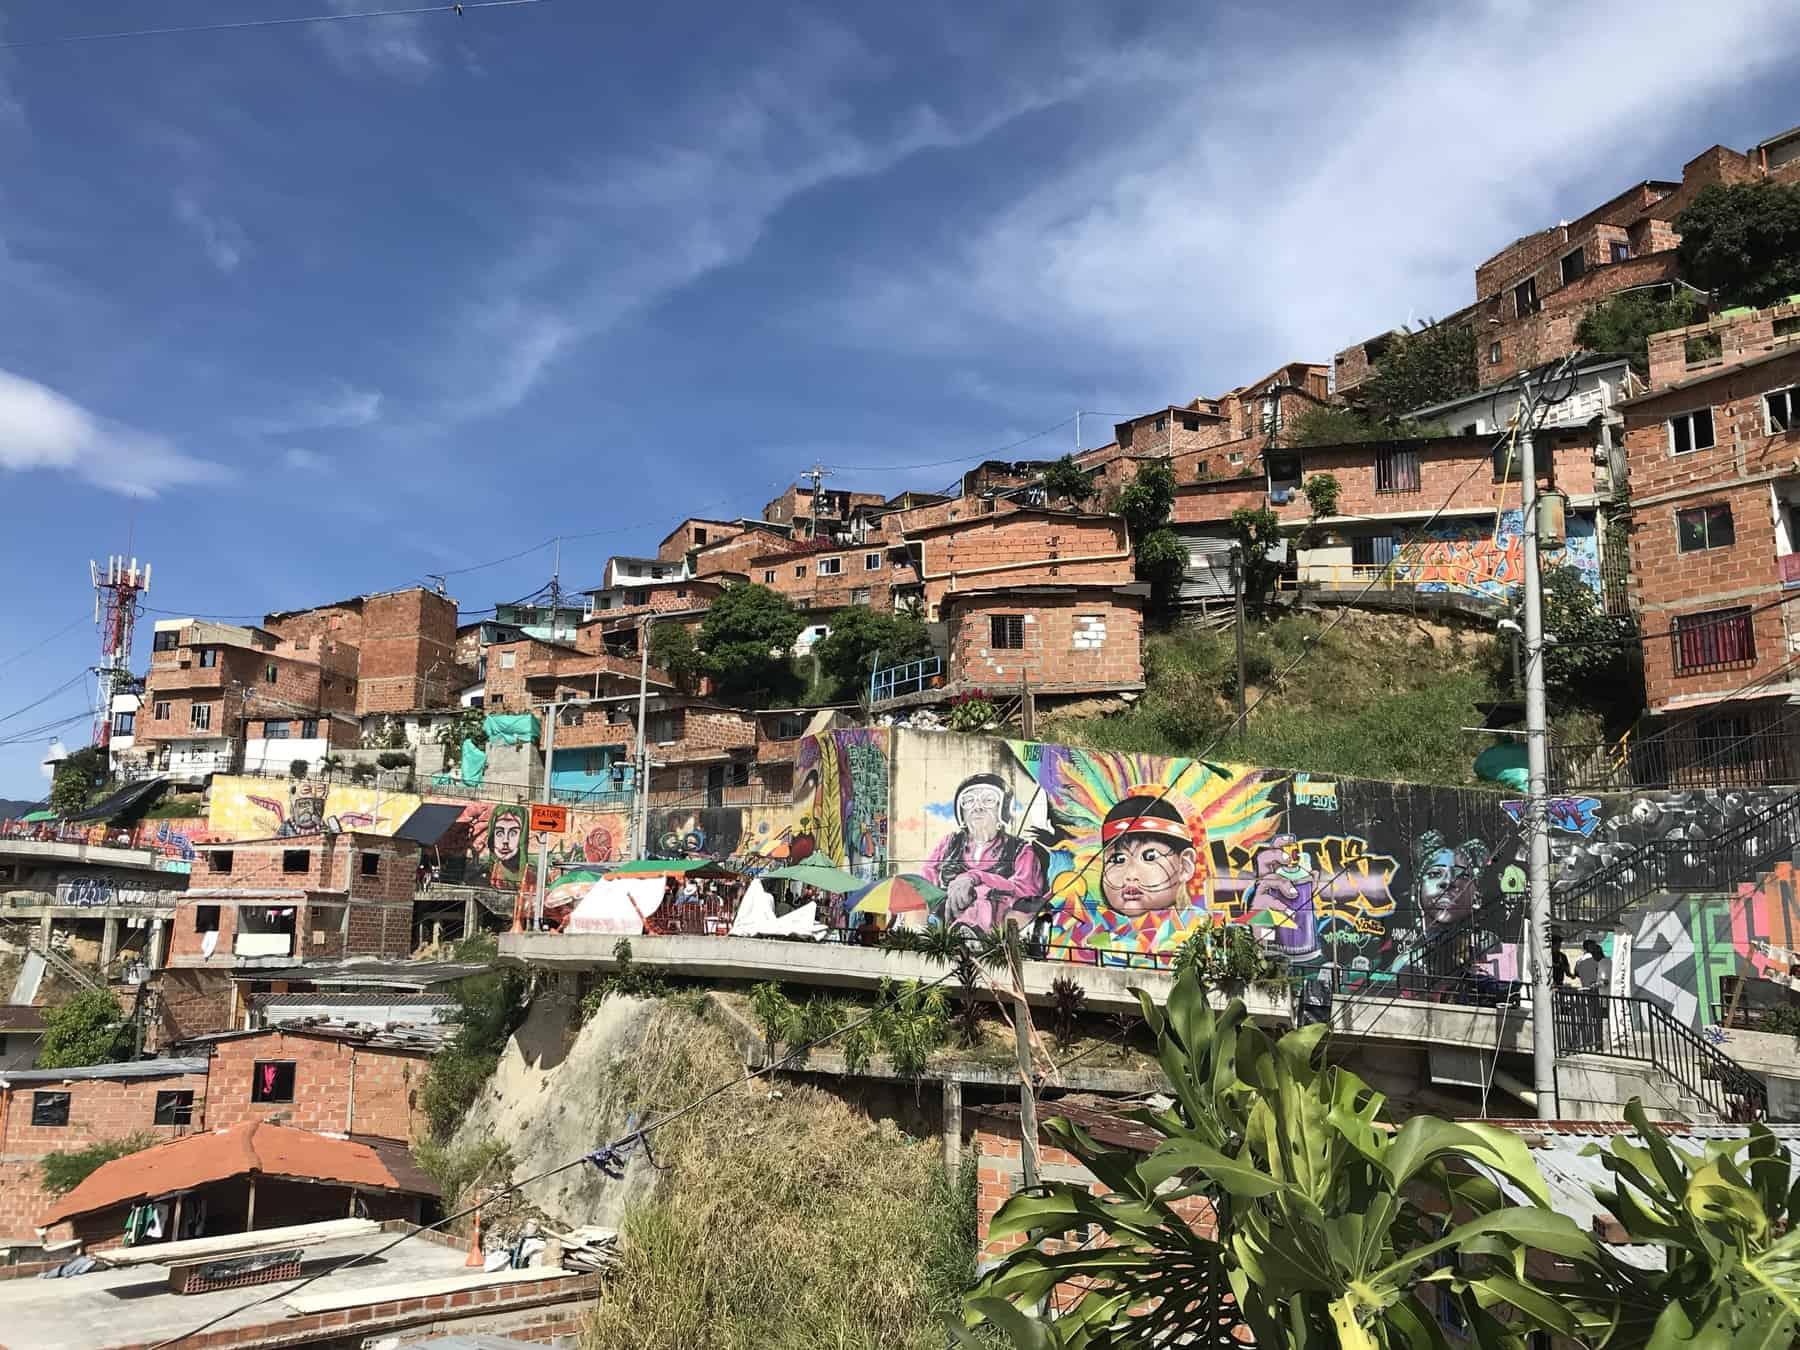 Comuna 13 Grafiti and Street